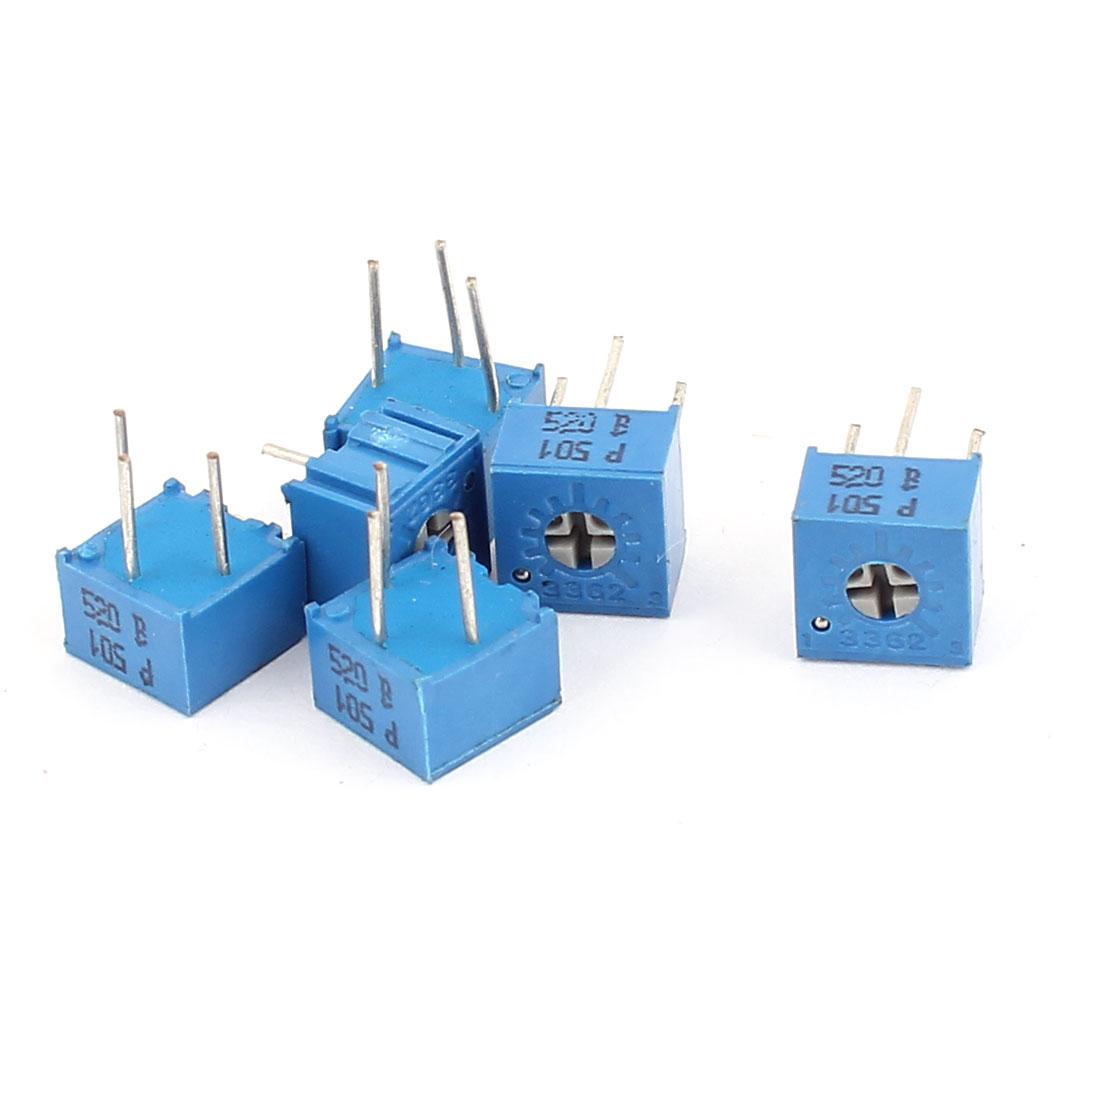 6 Pcs 3362P-501 500 Ohm Square Trimming Potentiometers